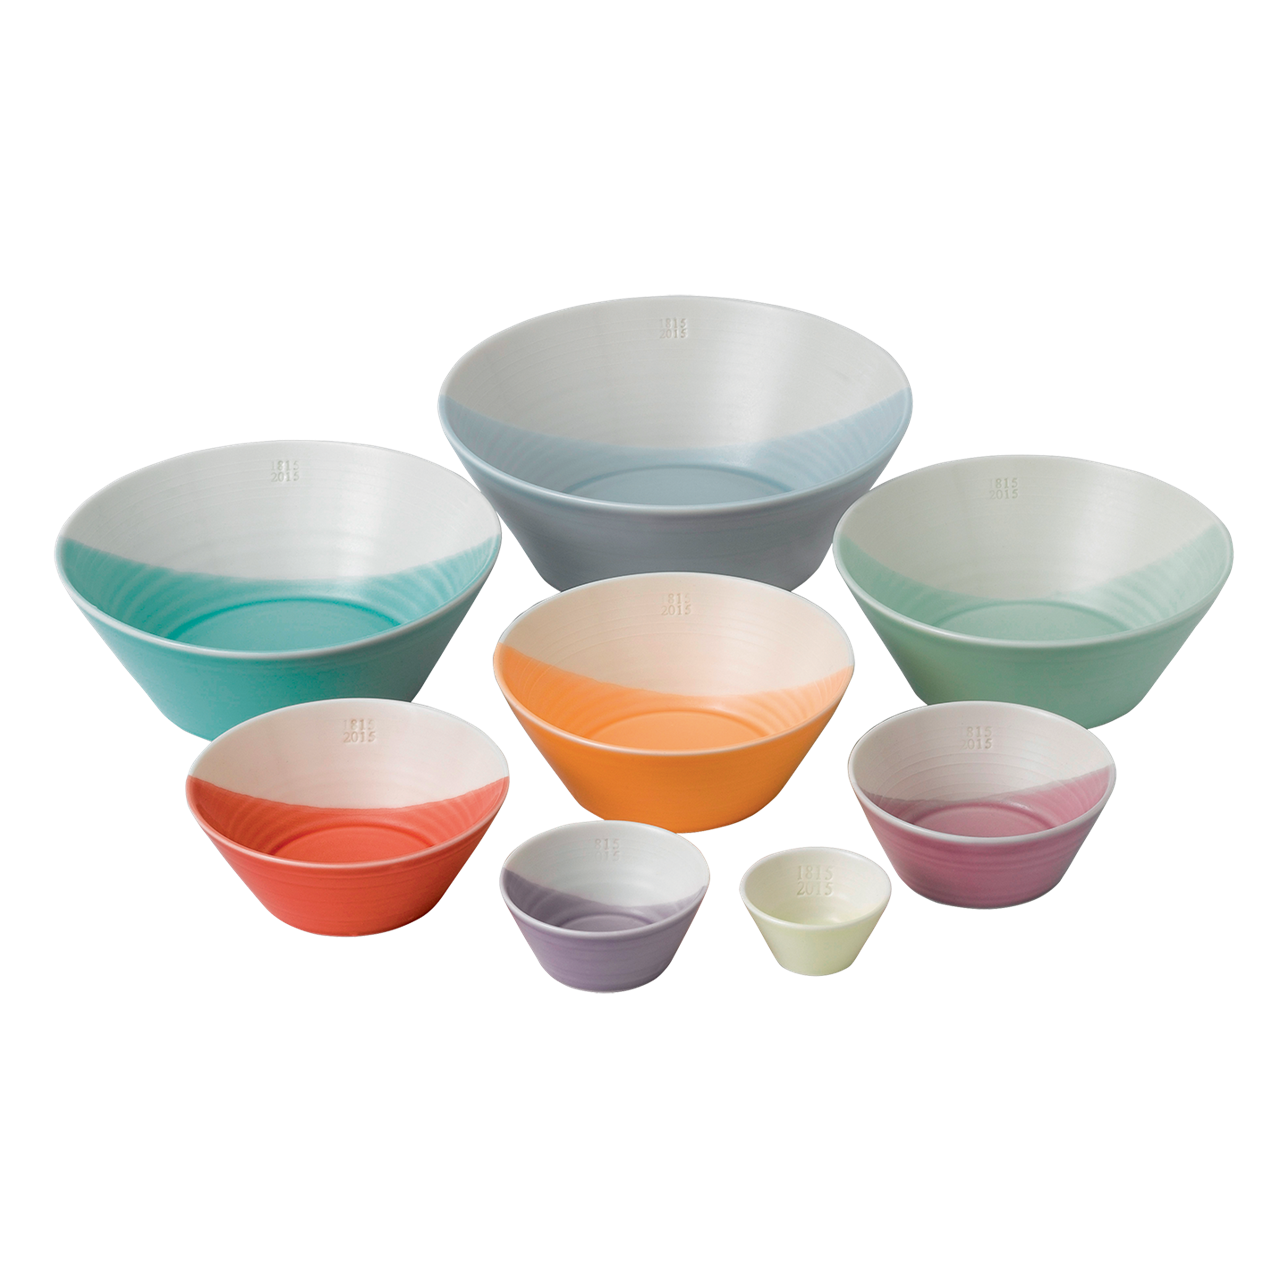 1815 Nesting Bowls (Set of 8)